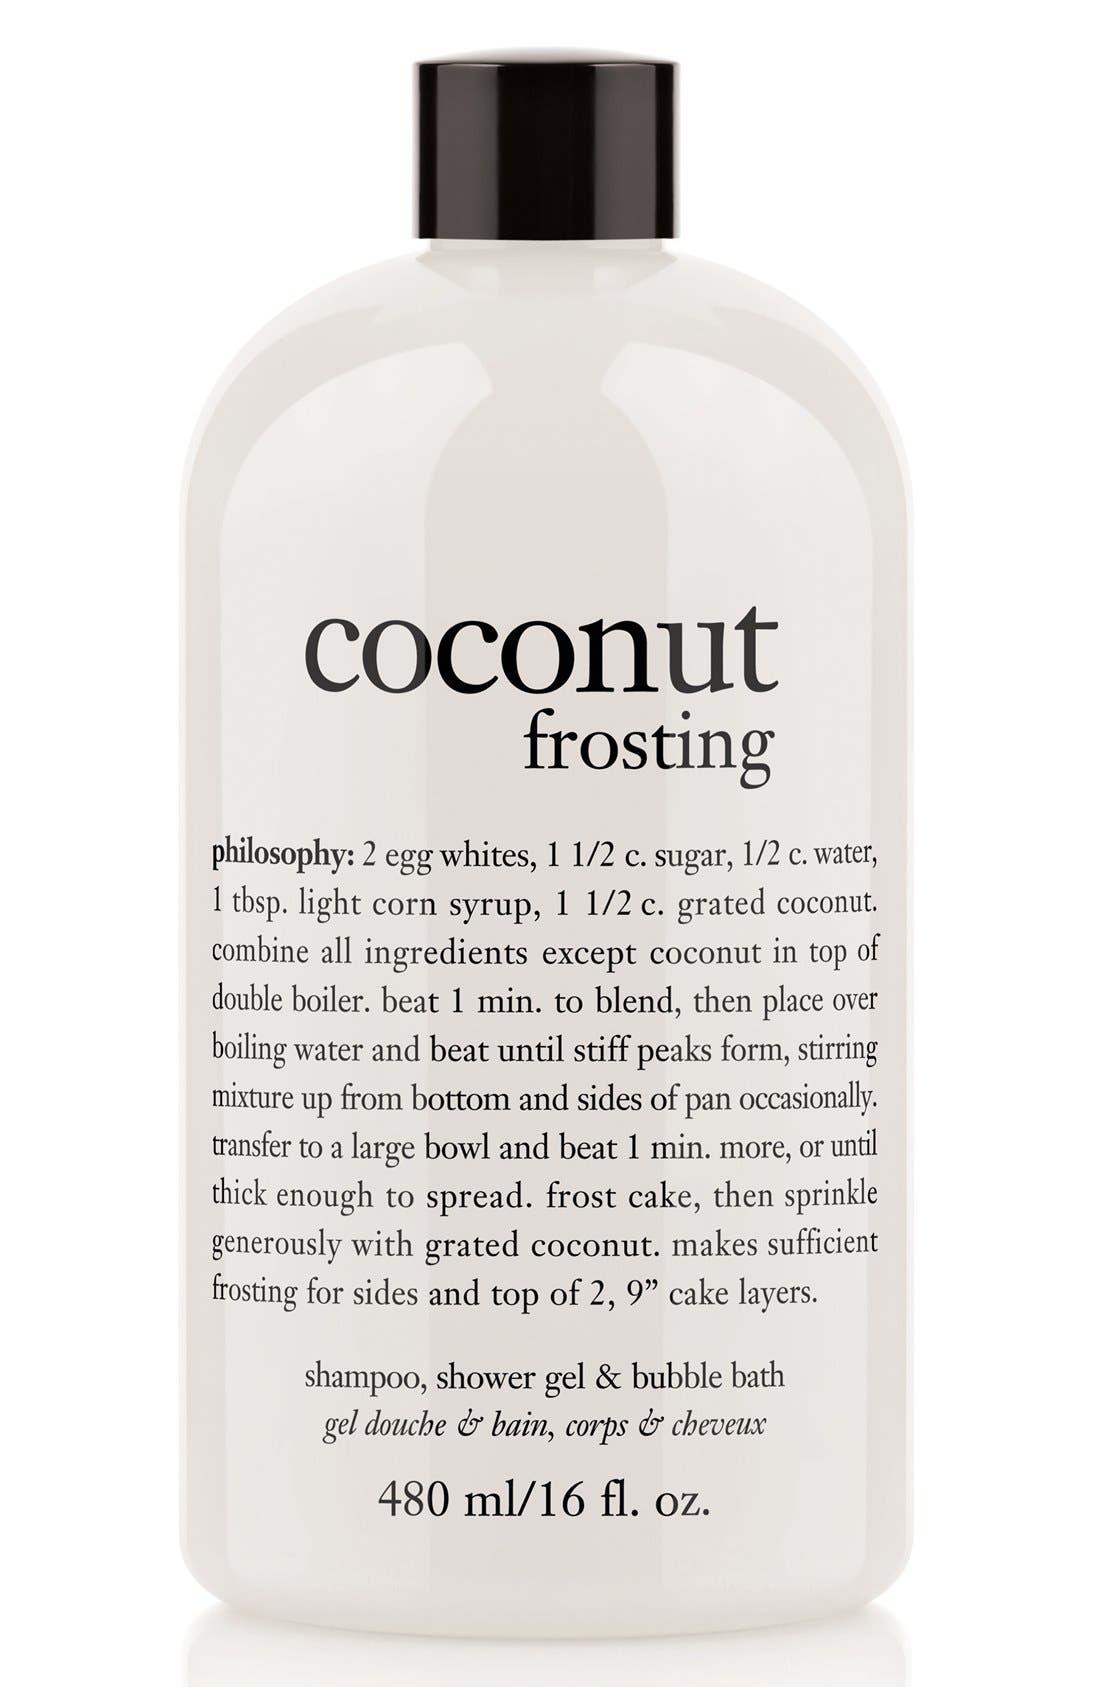 PHILOSOPHY 'coconut frosting' shampoo, shower gel & bubble bath, Main, color, COCONUT FROSTING